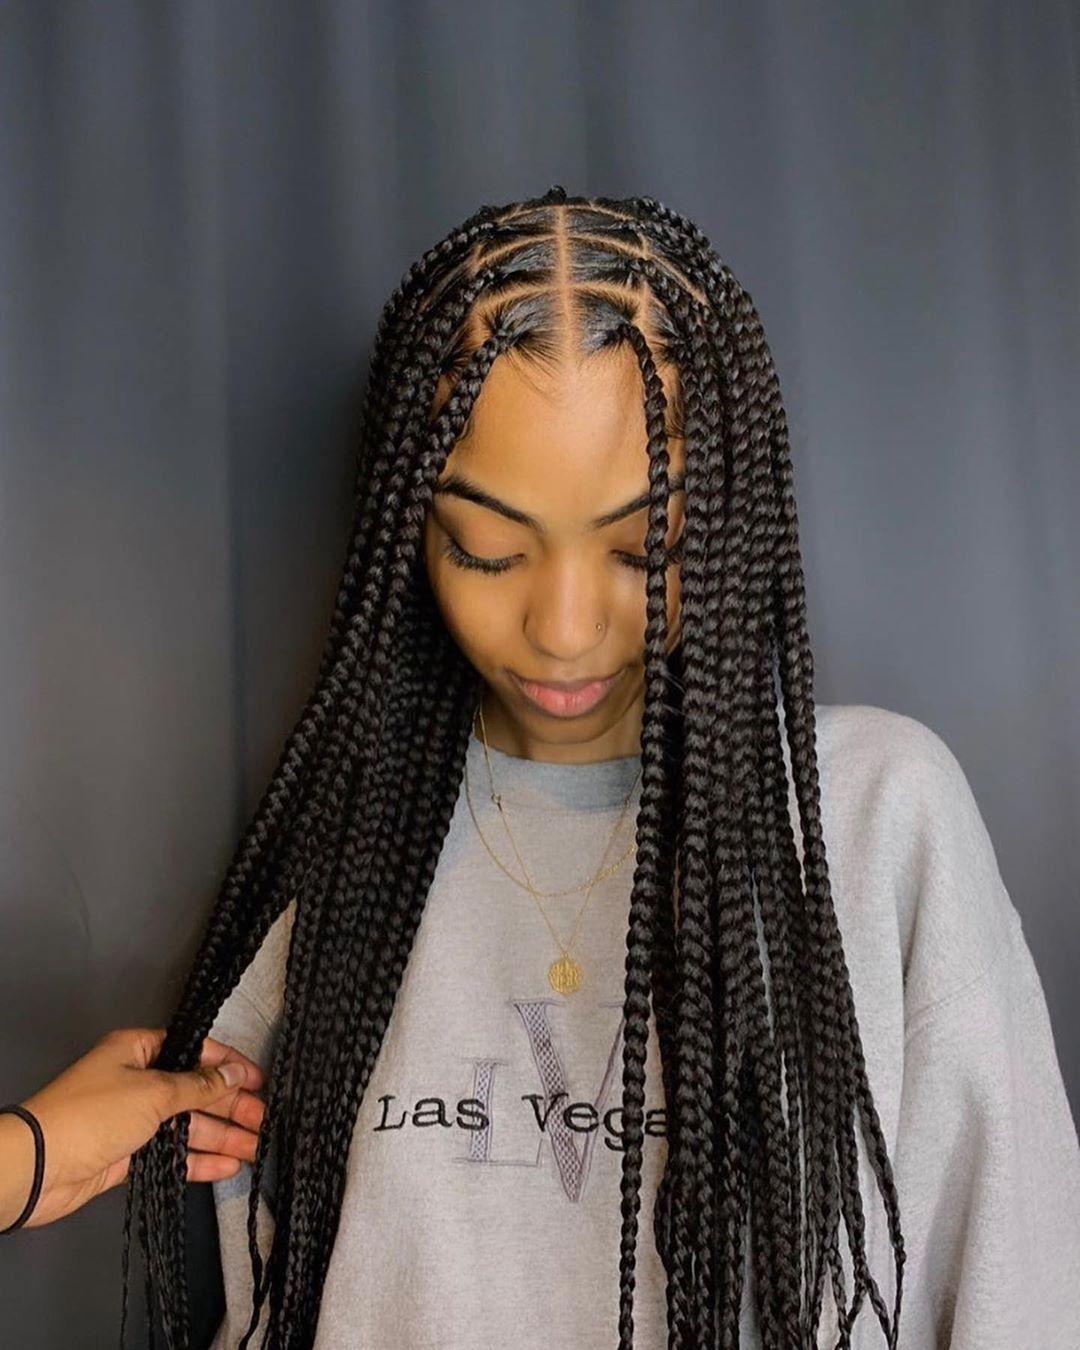 Knotless Braids Braids For Short Hair Box Braids Styling Black Girl Braided Hairstyles